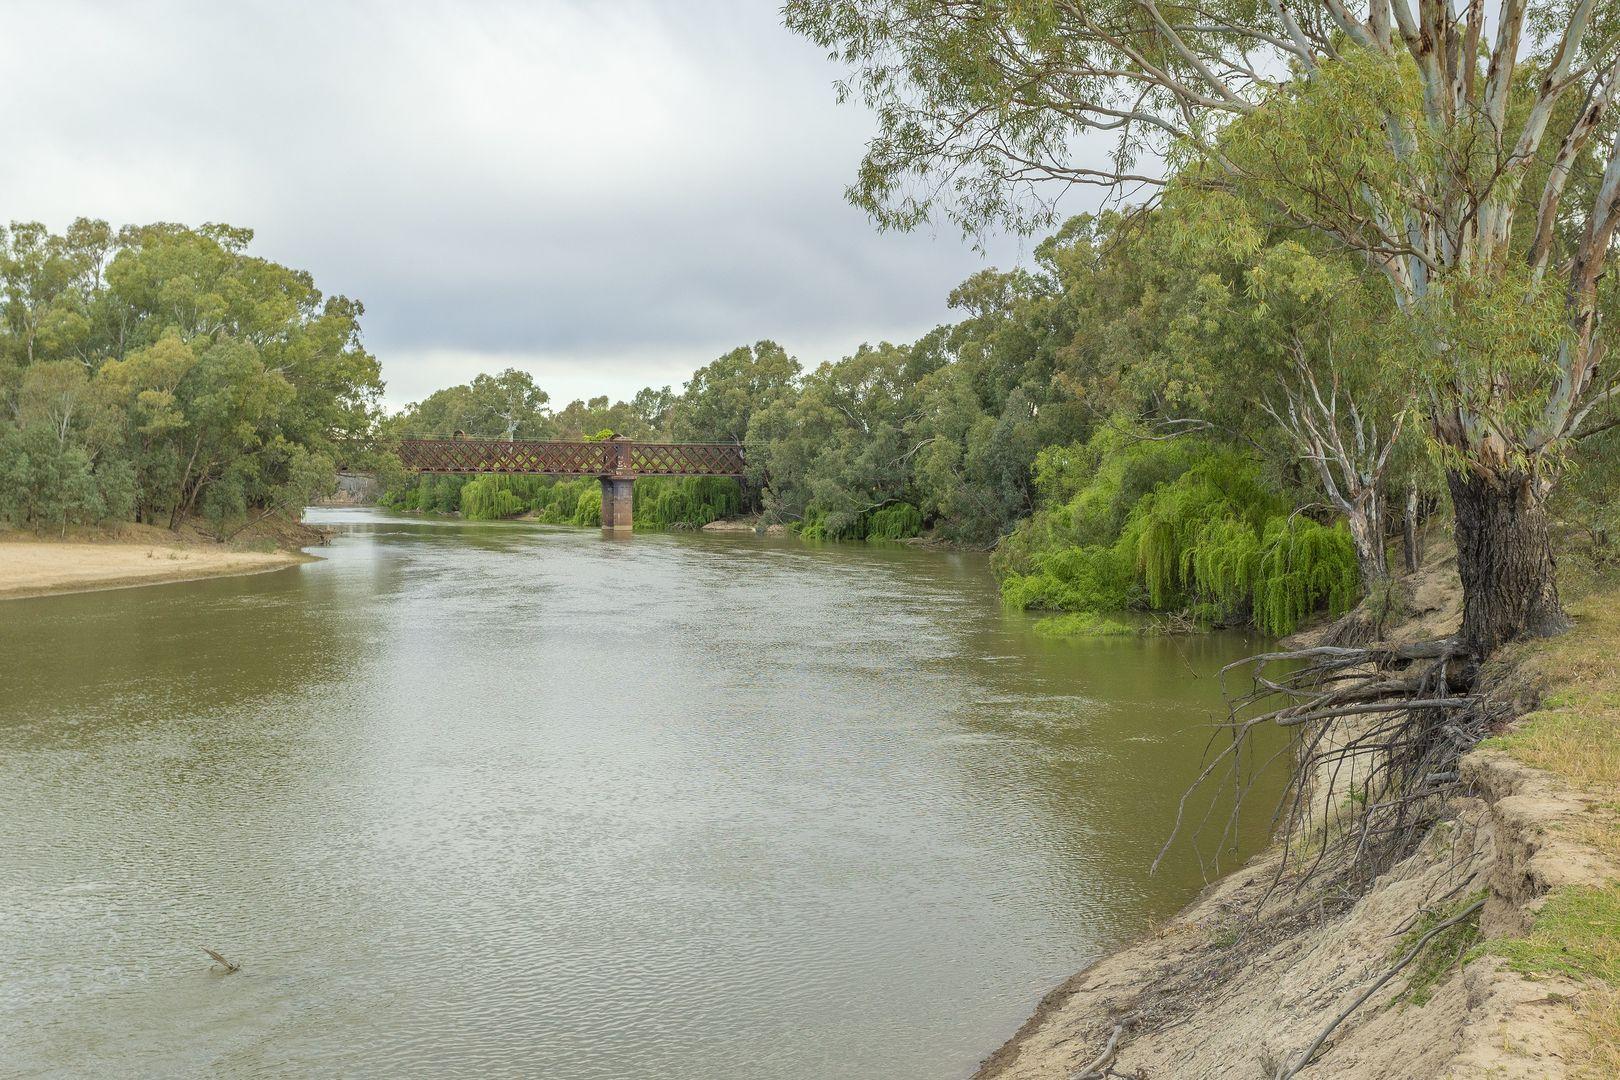 Lot 2 of 9642 Sturt Highway, Narrandera NSW 2700, Image 2